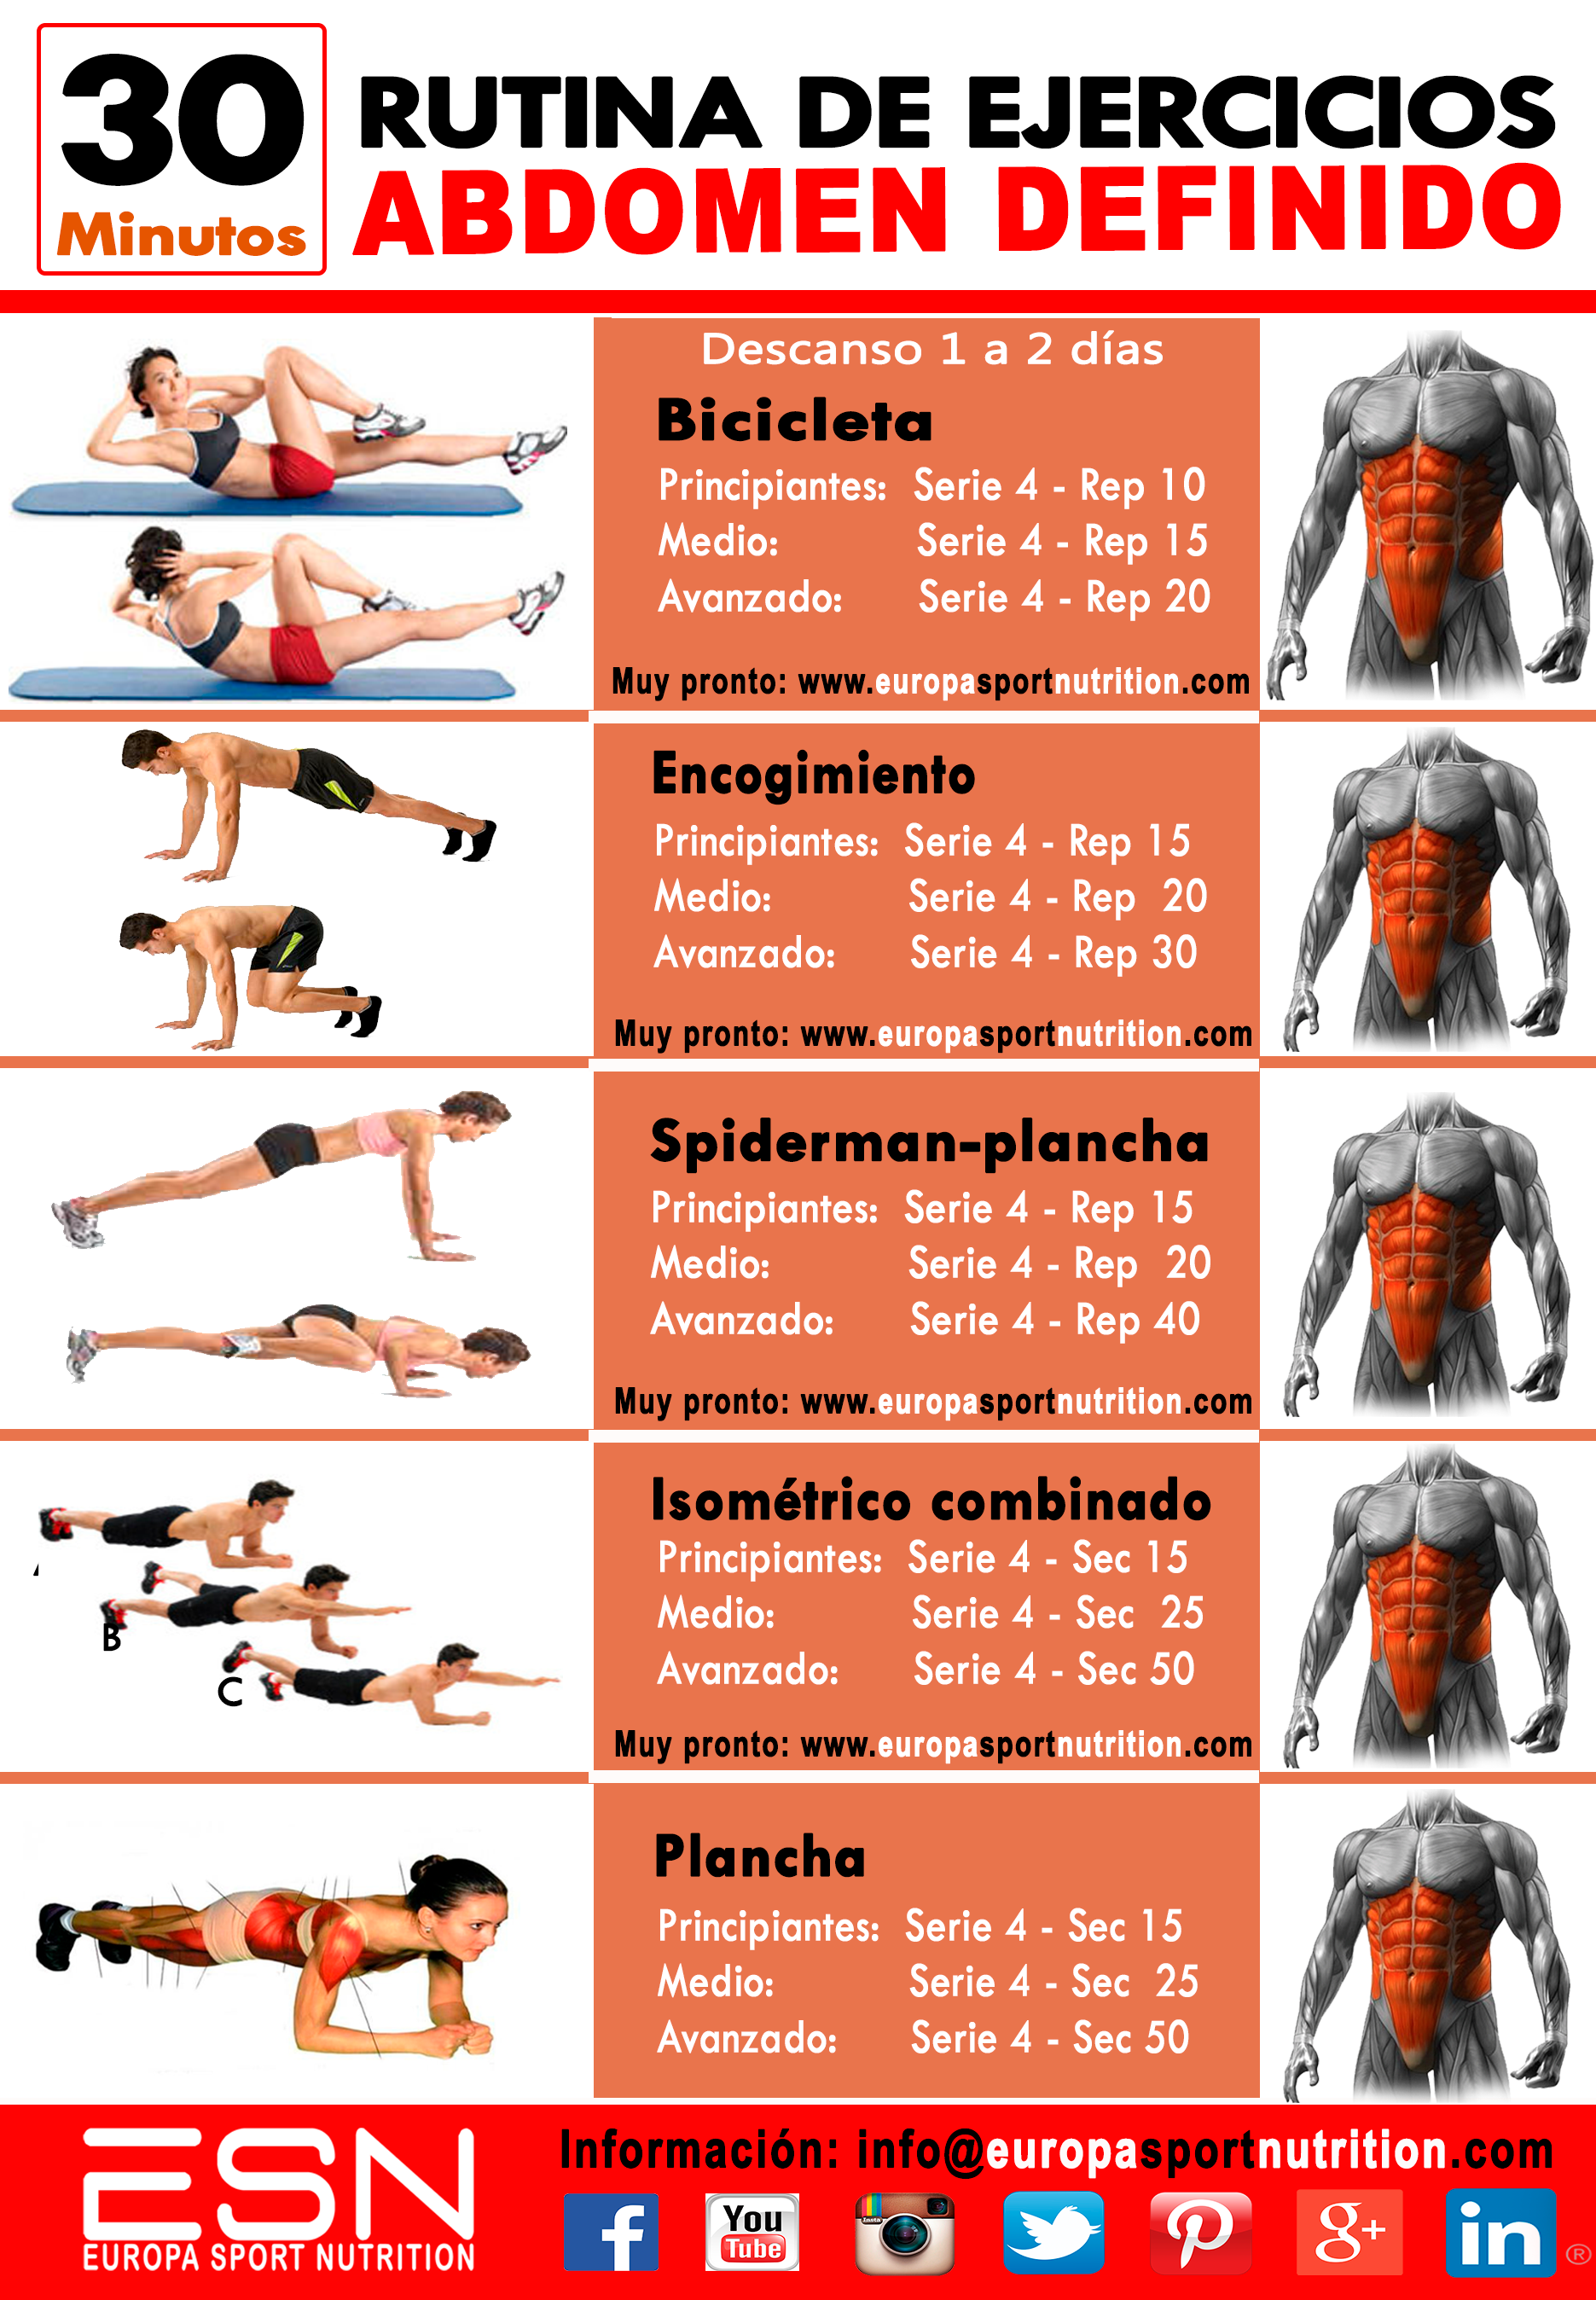 Abdomen definido rutina de ejercicios de 30 minutos for Dieta gimnasio